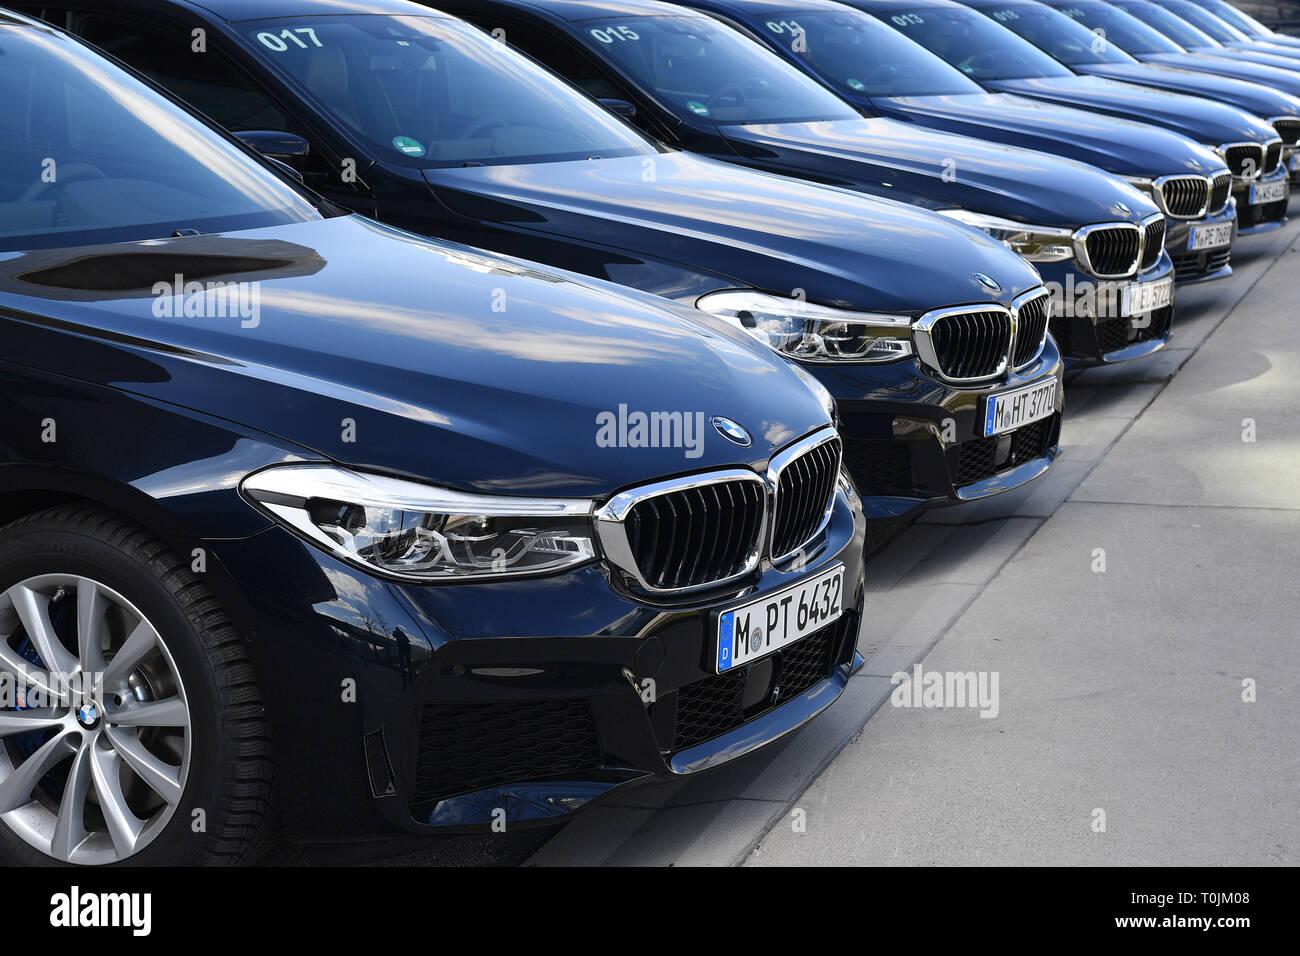 Munich Deutschland 20th Mar 2019 Bmw Cars Cars Are In A Run